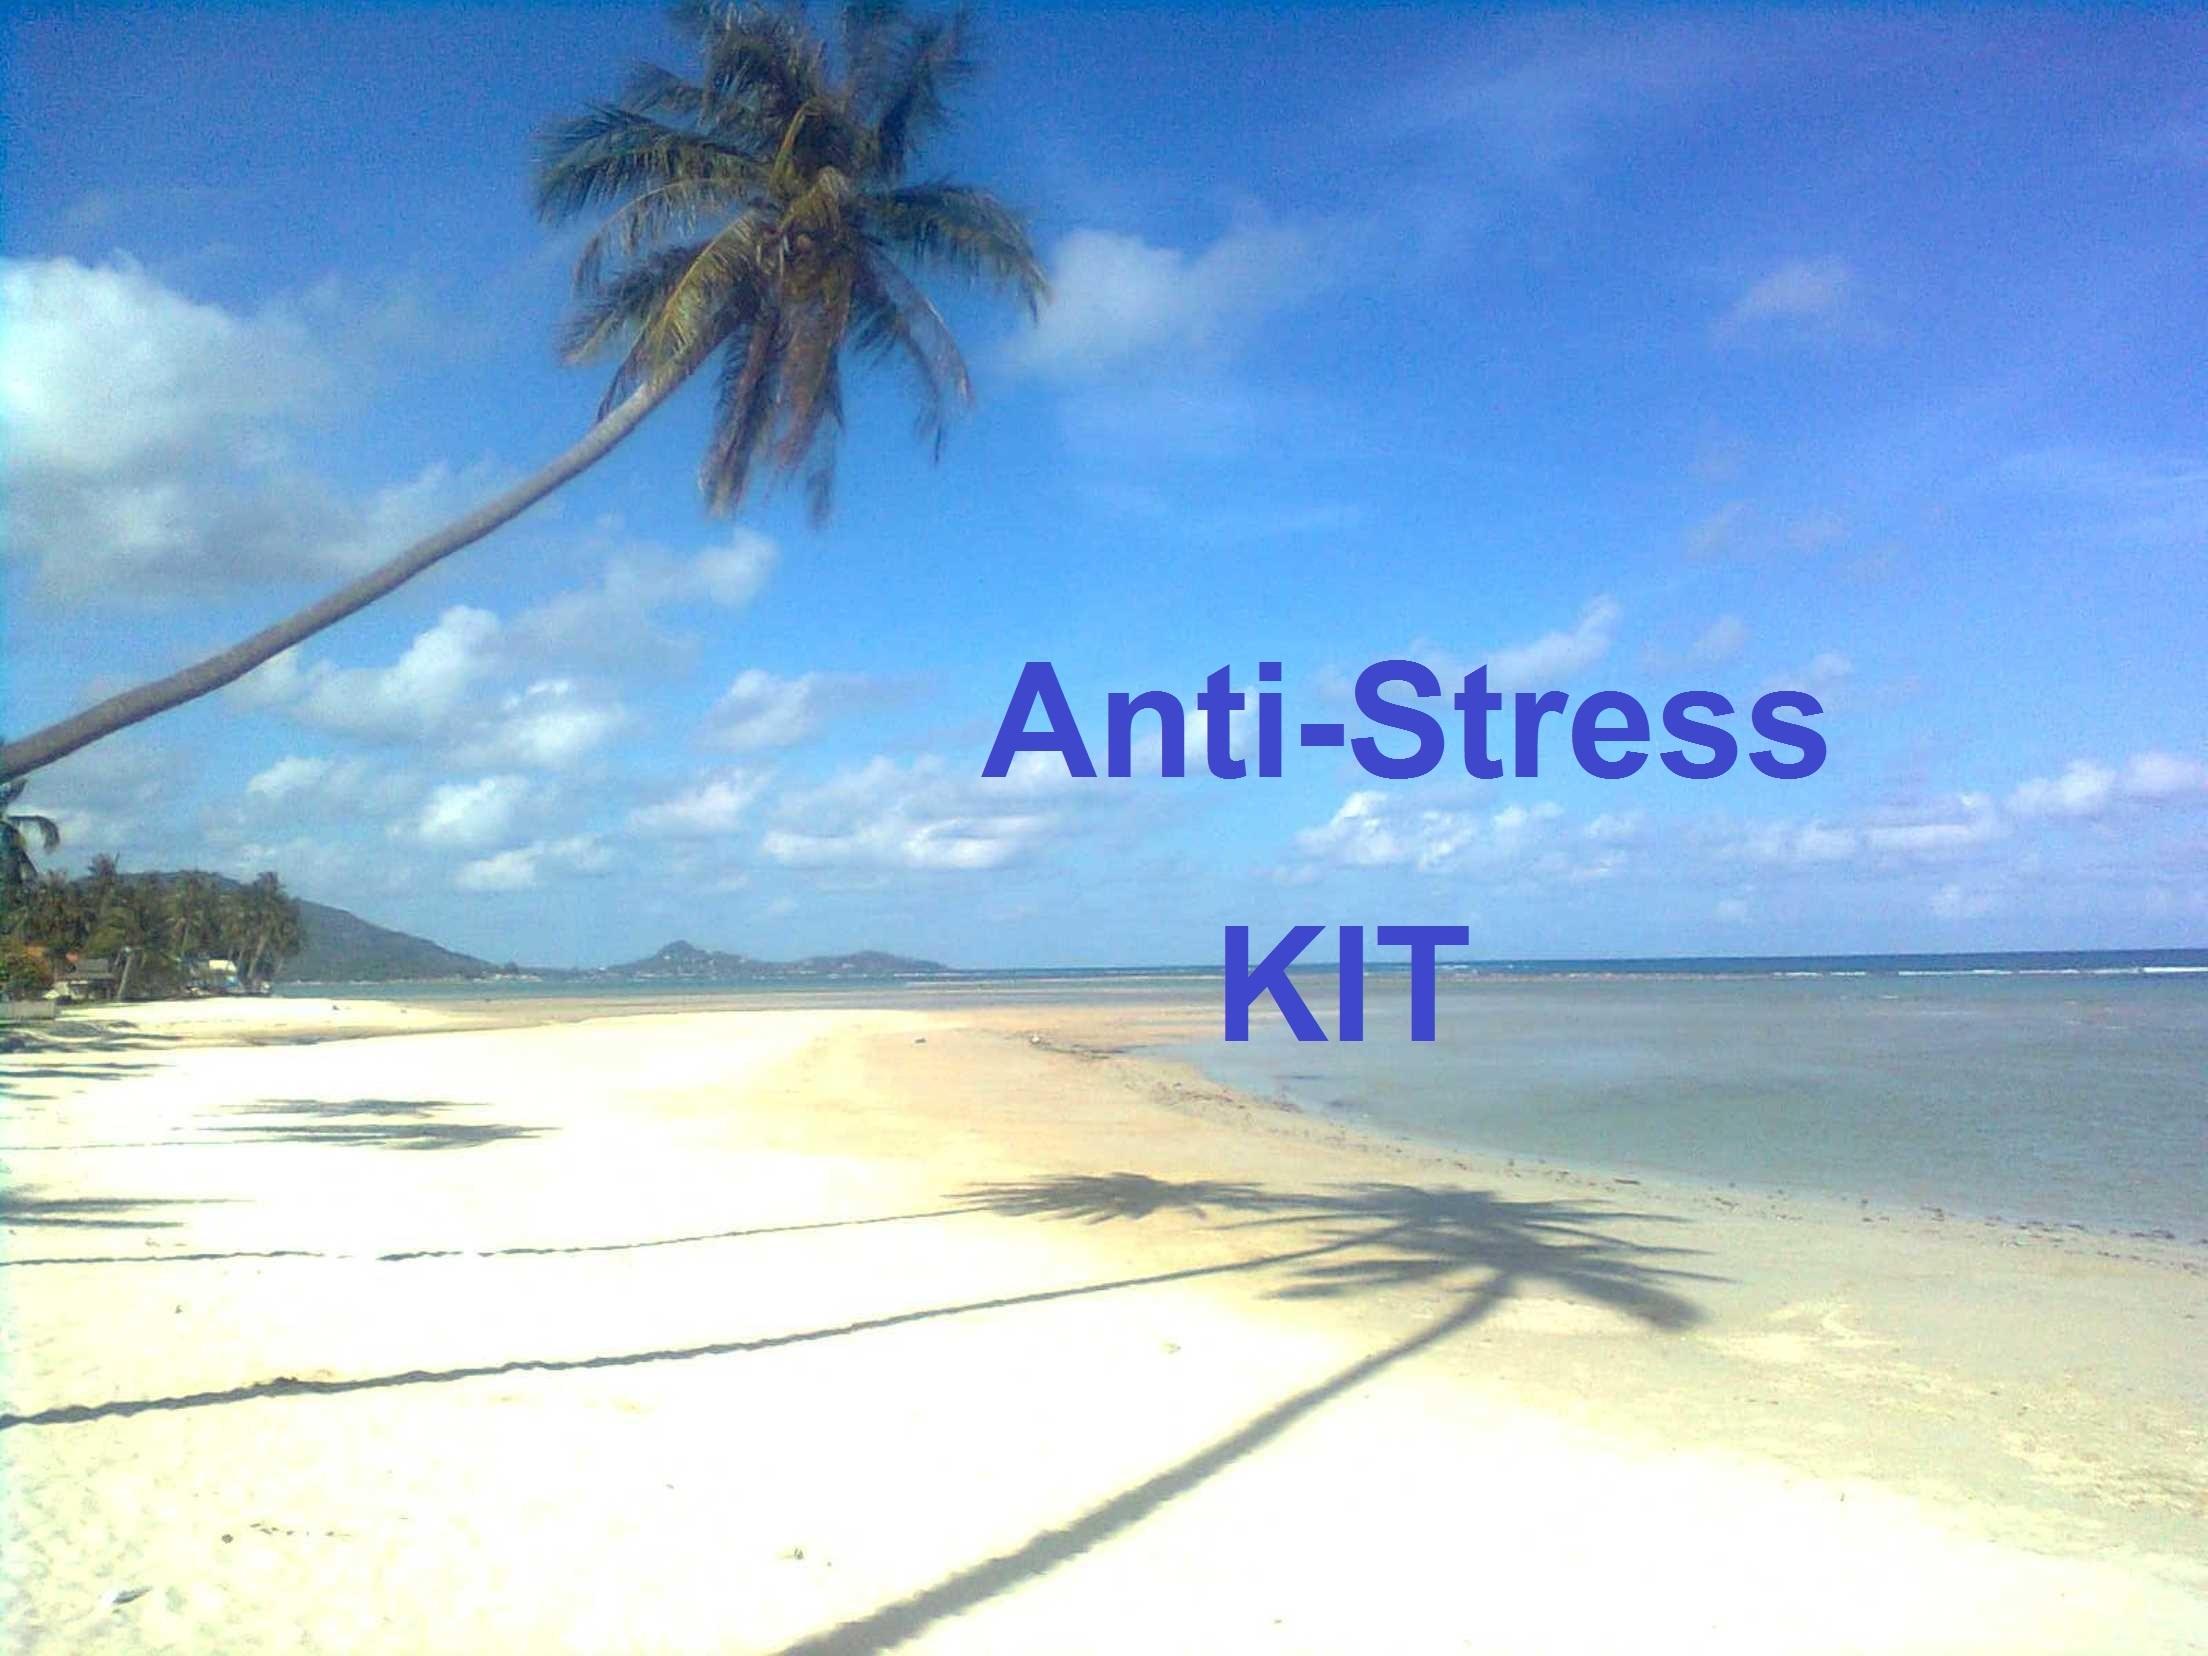 Anti-Stress-Paket (5 Hypnose-mp3 plus Bonusbuch) 00010